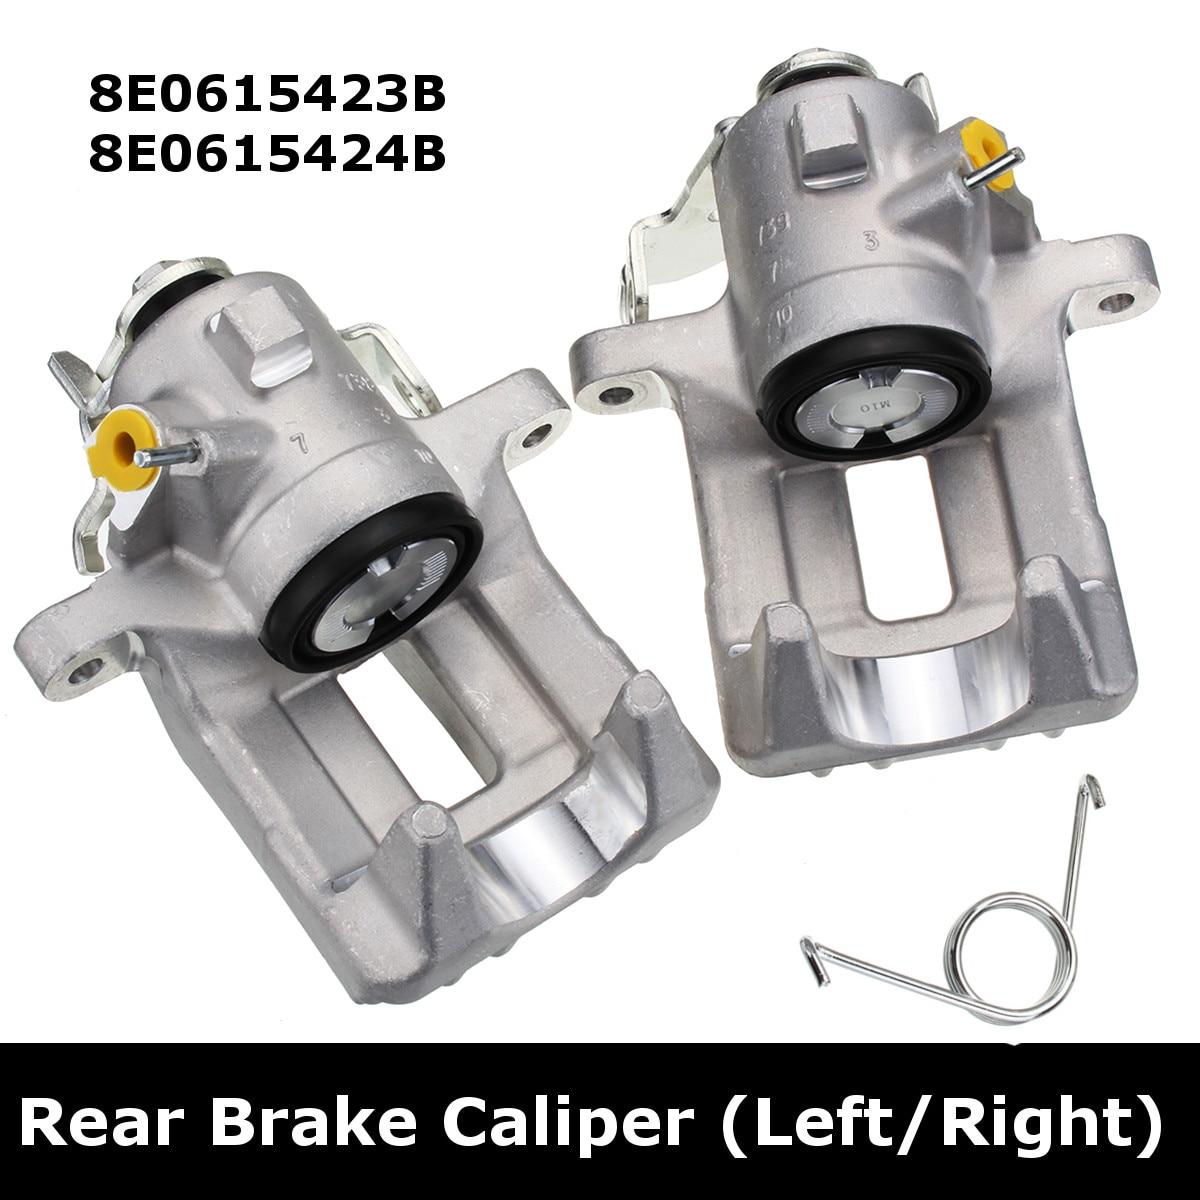 Rear Left/Right Brake Caliper 8E0615423B 8E0615424B For VW Passat 3B5 For Audi A4 A6|Caliper & Parts| |  - title=